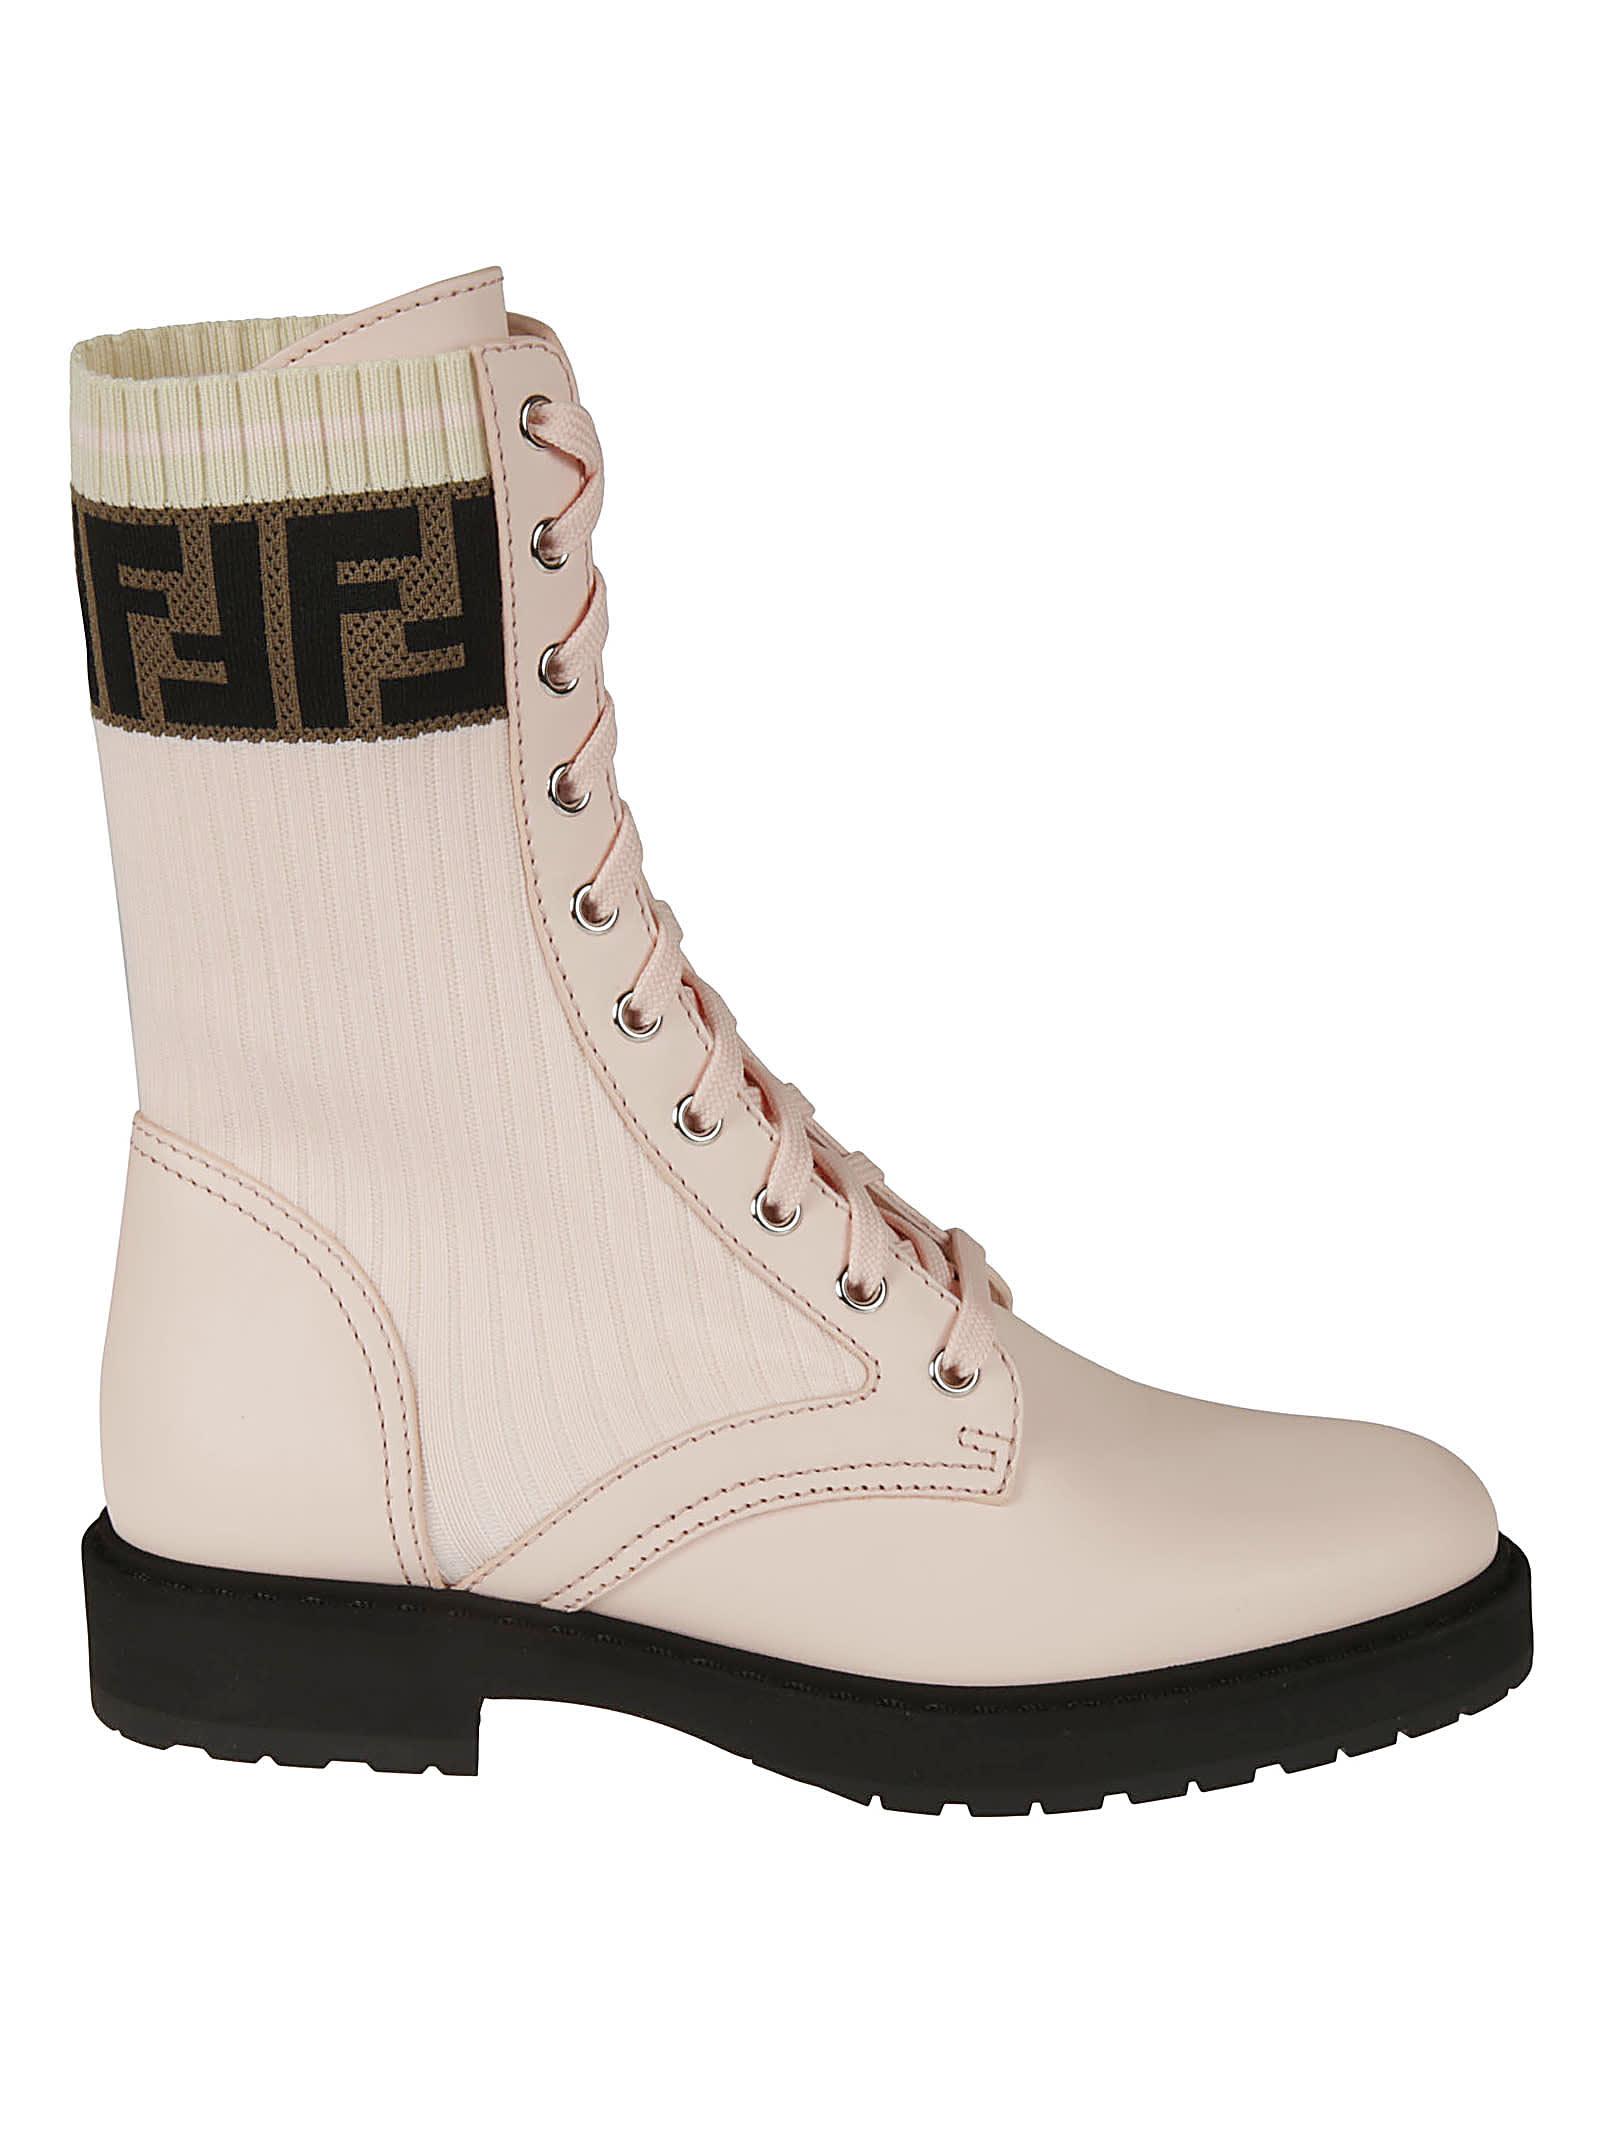 Buy Fendi Biker Logo Boots online, shop Fendi shoes with free shipping